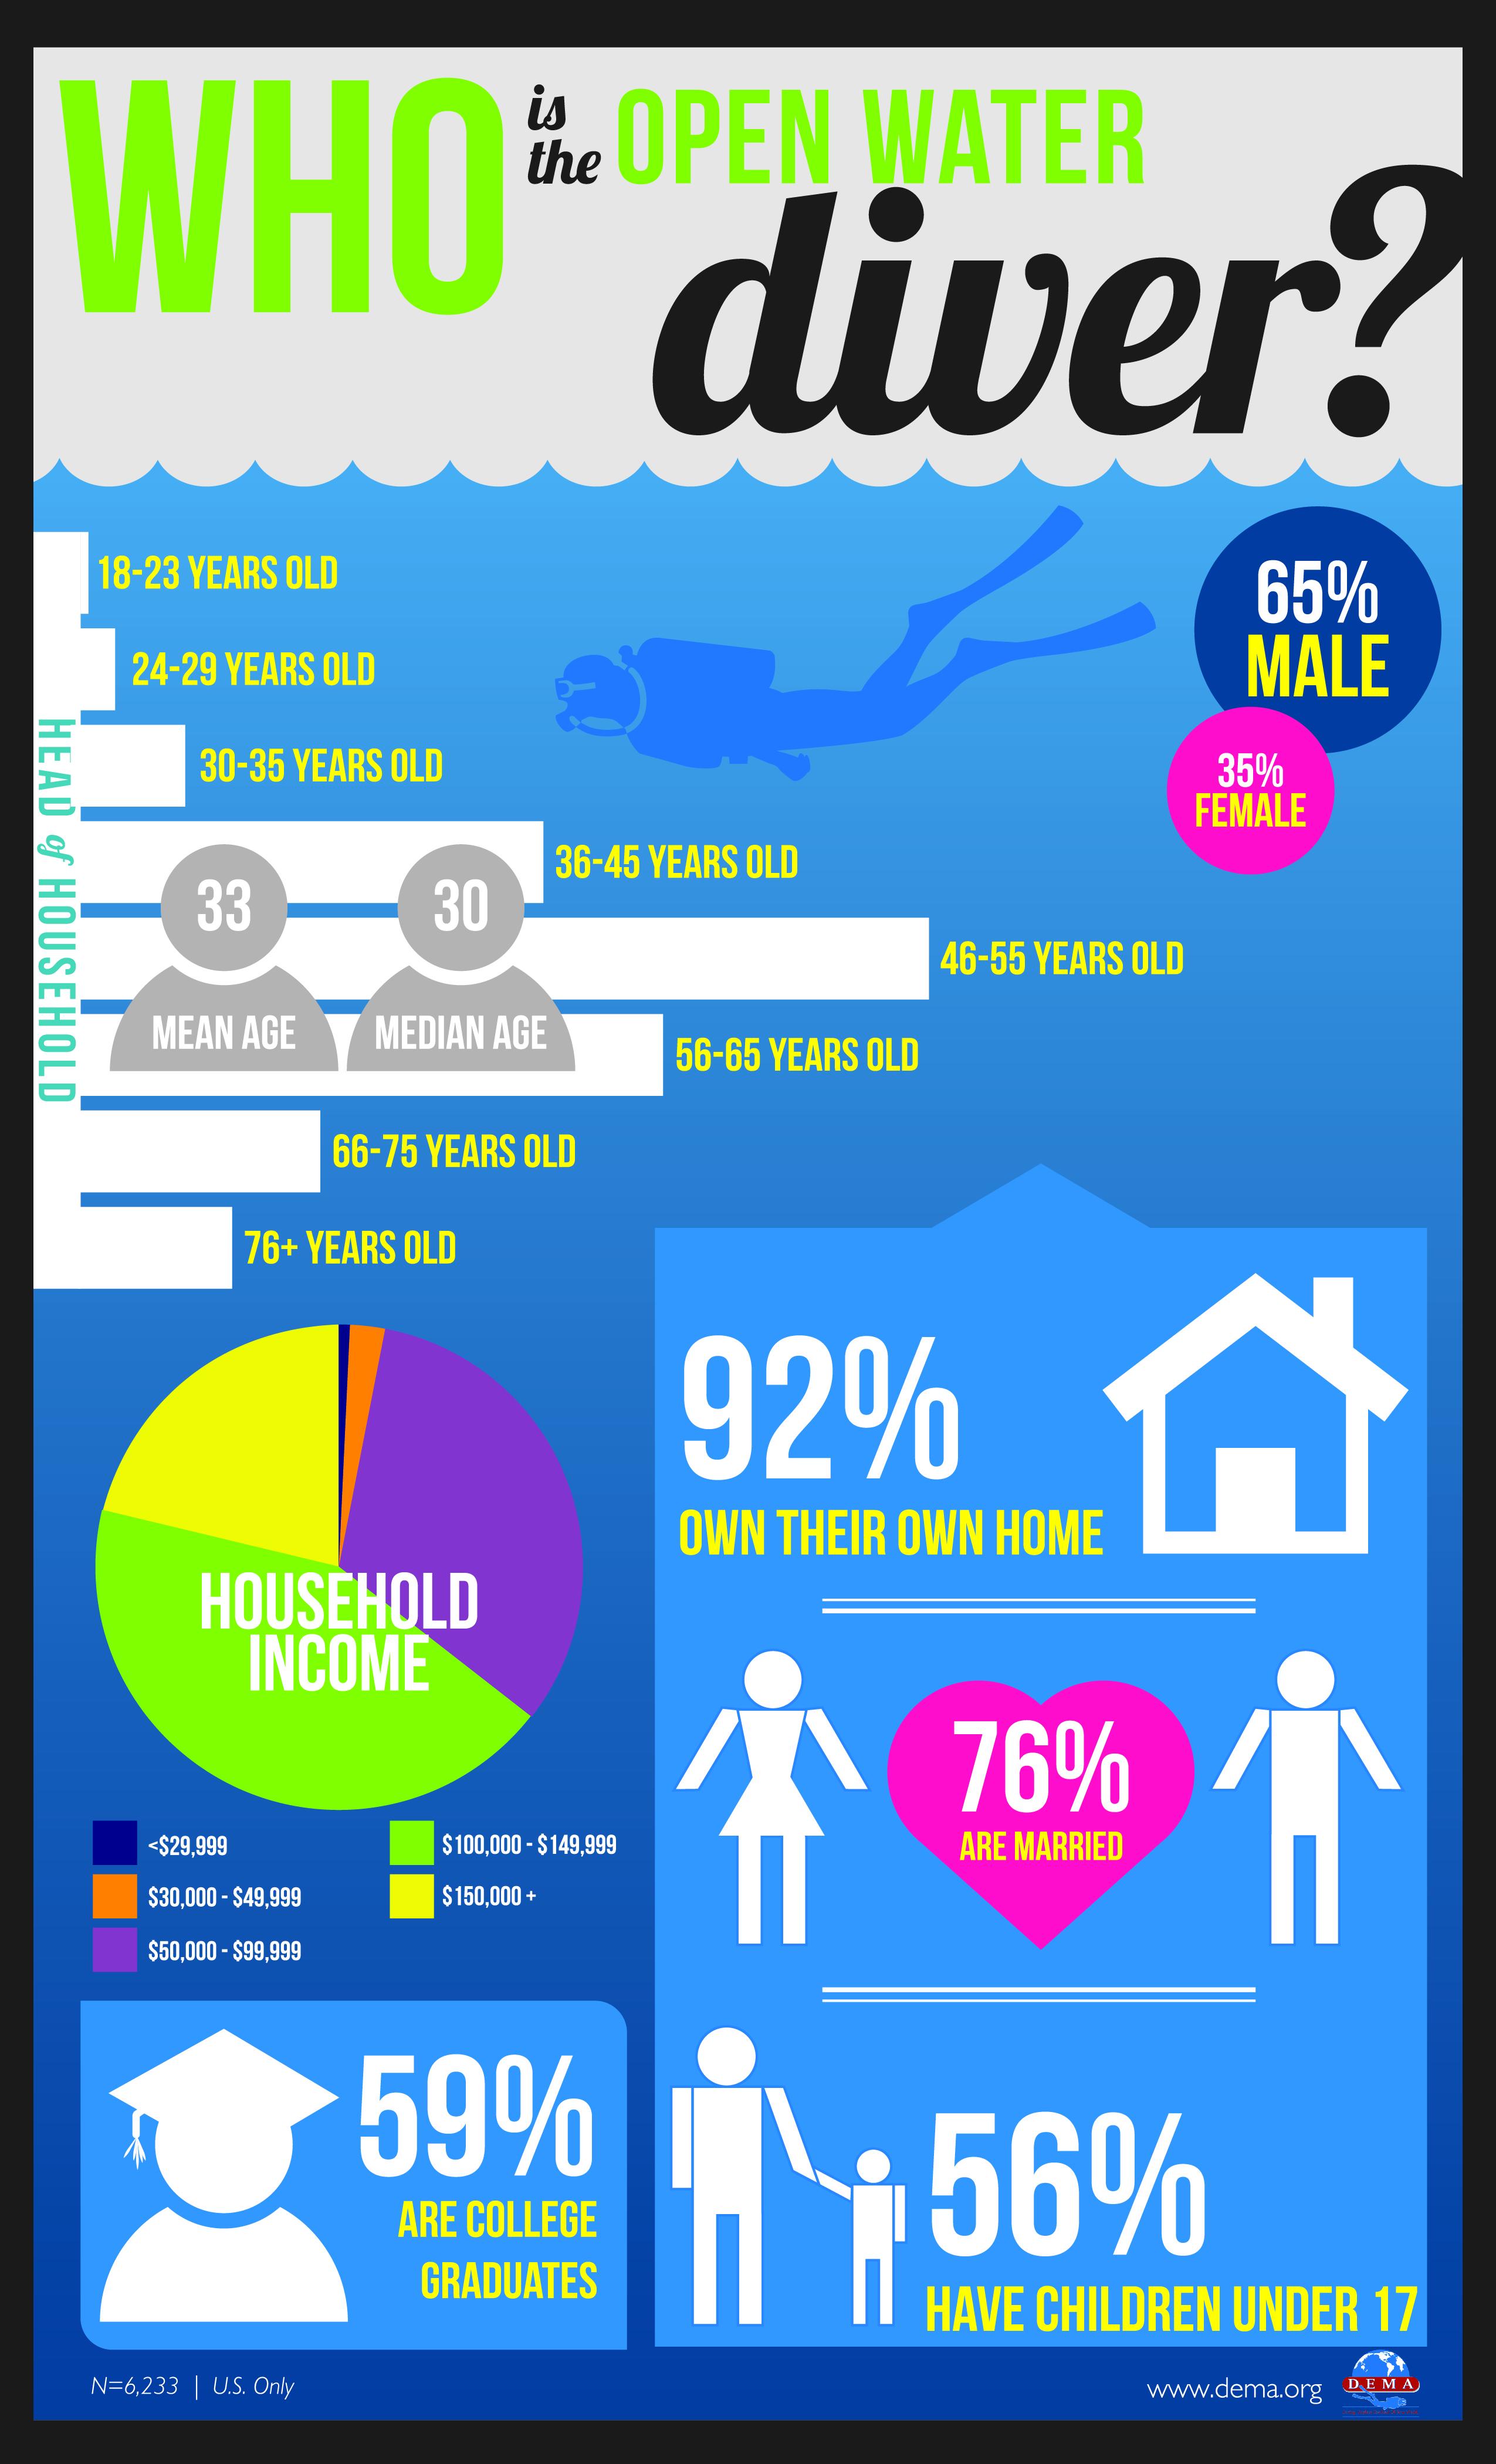 padi open water diver manual pdf free download